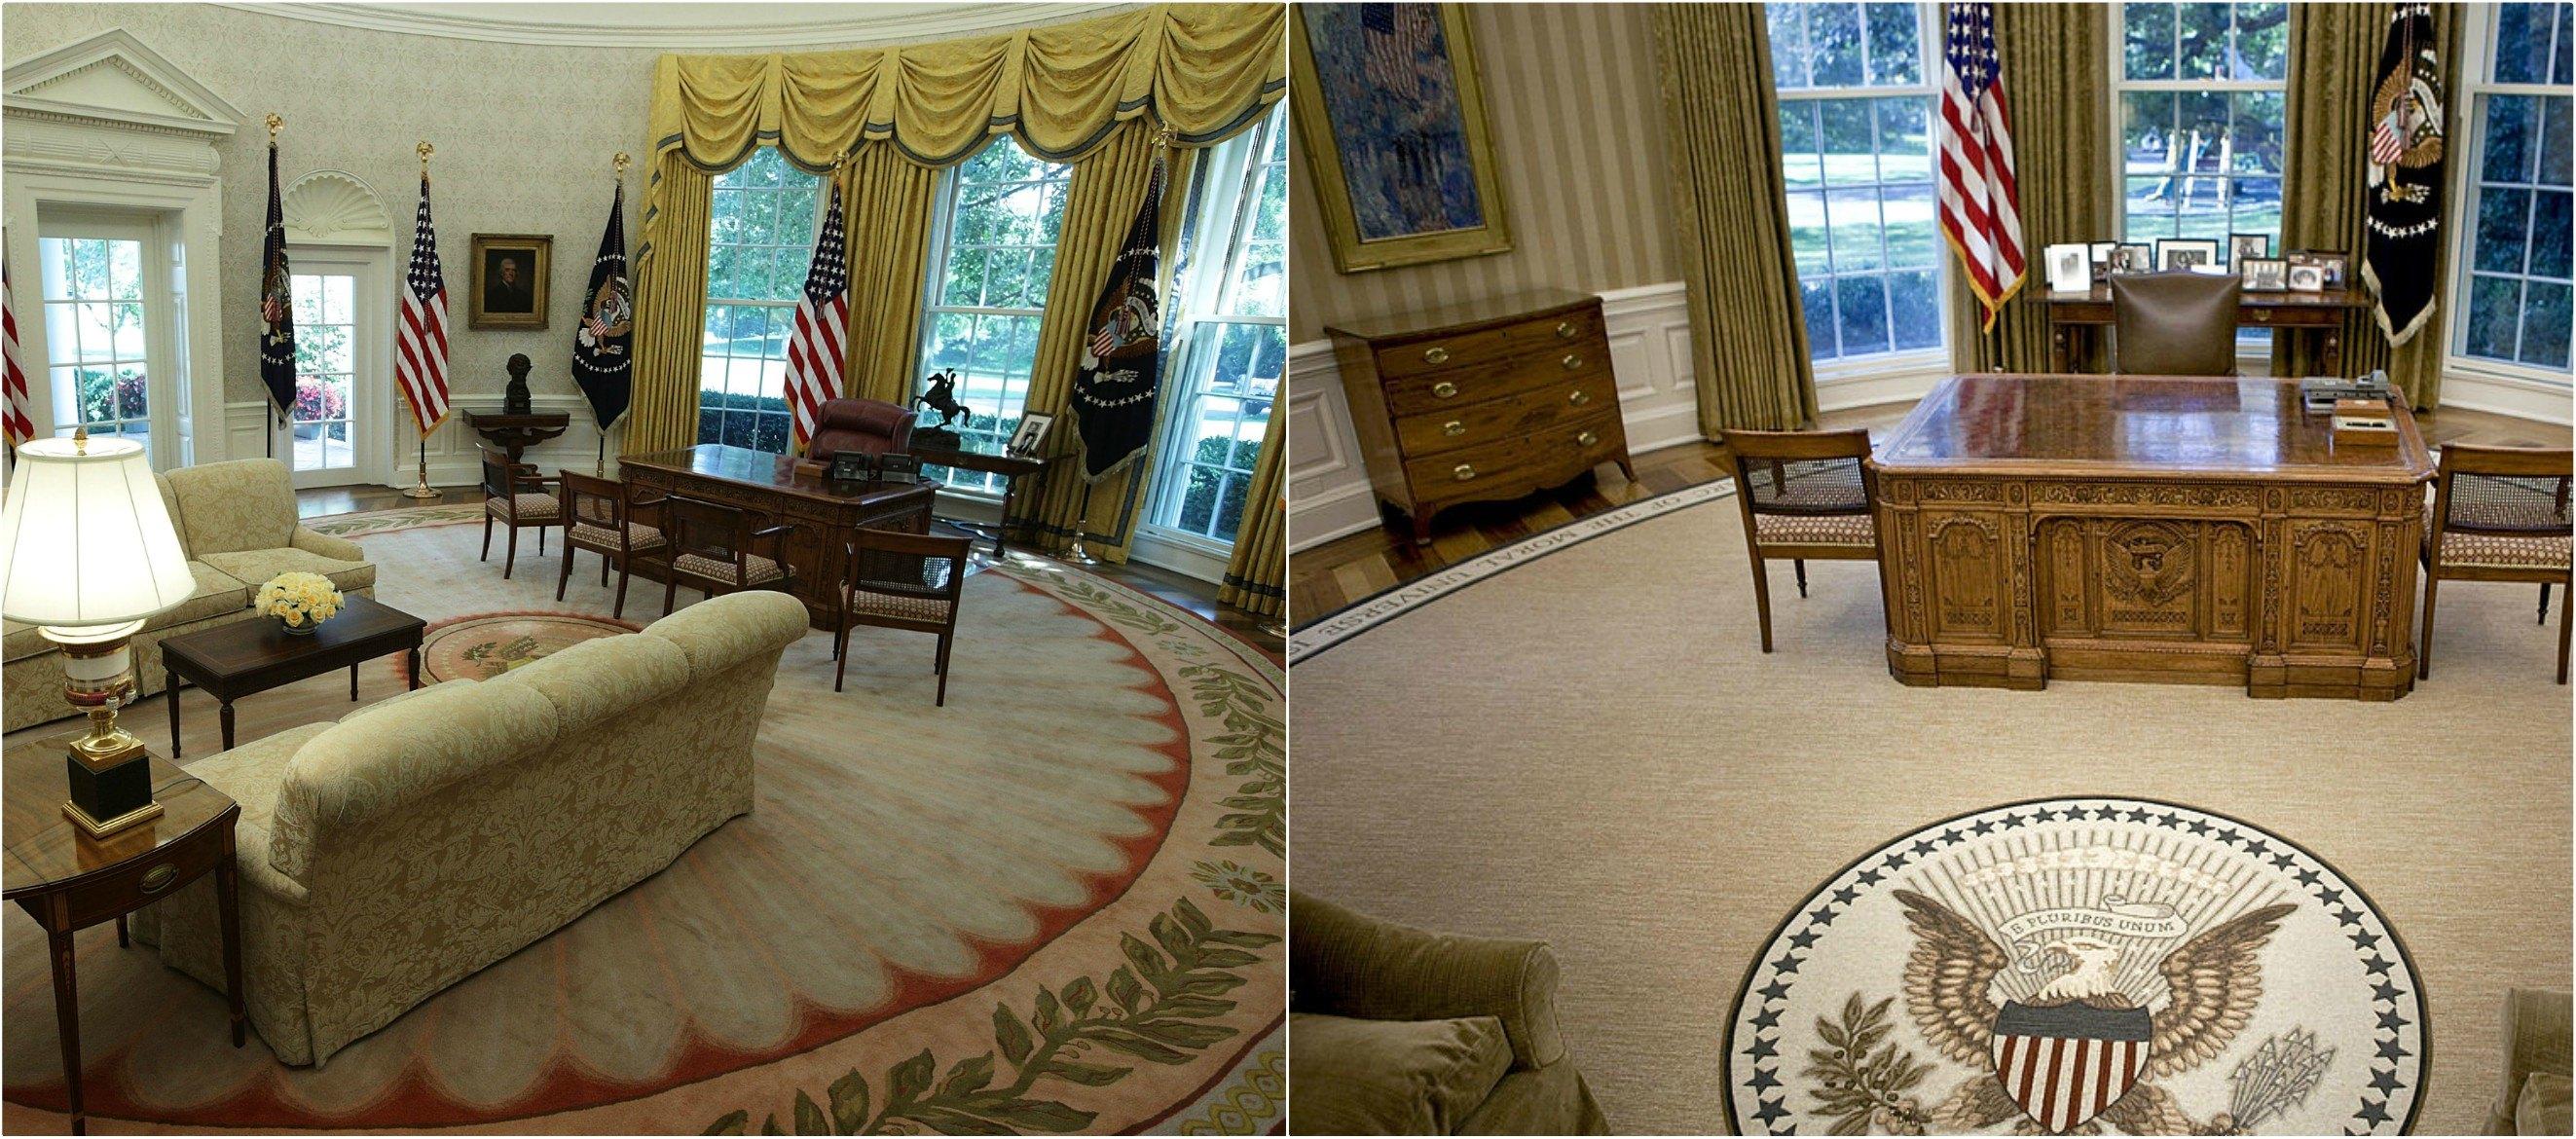 west wing oval office. West Wing Oval Office. Office Renovations O F